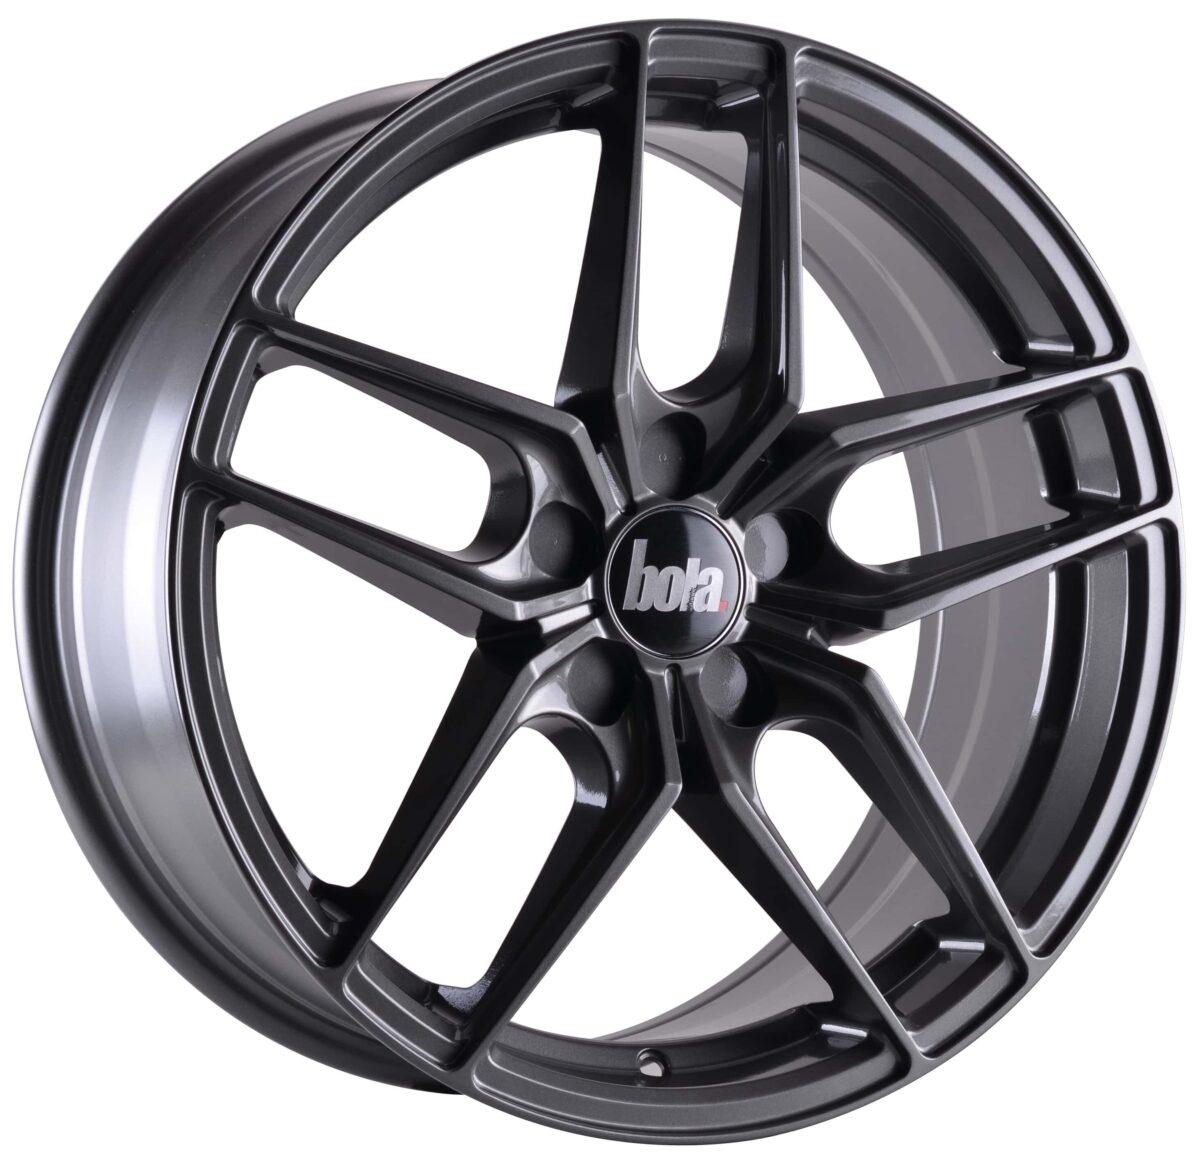 "19"" BOLA B11 Wheels - Gloss Gunmetal - VW / Audi / Mercedes - 5x112"